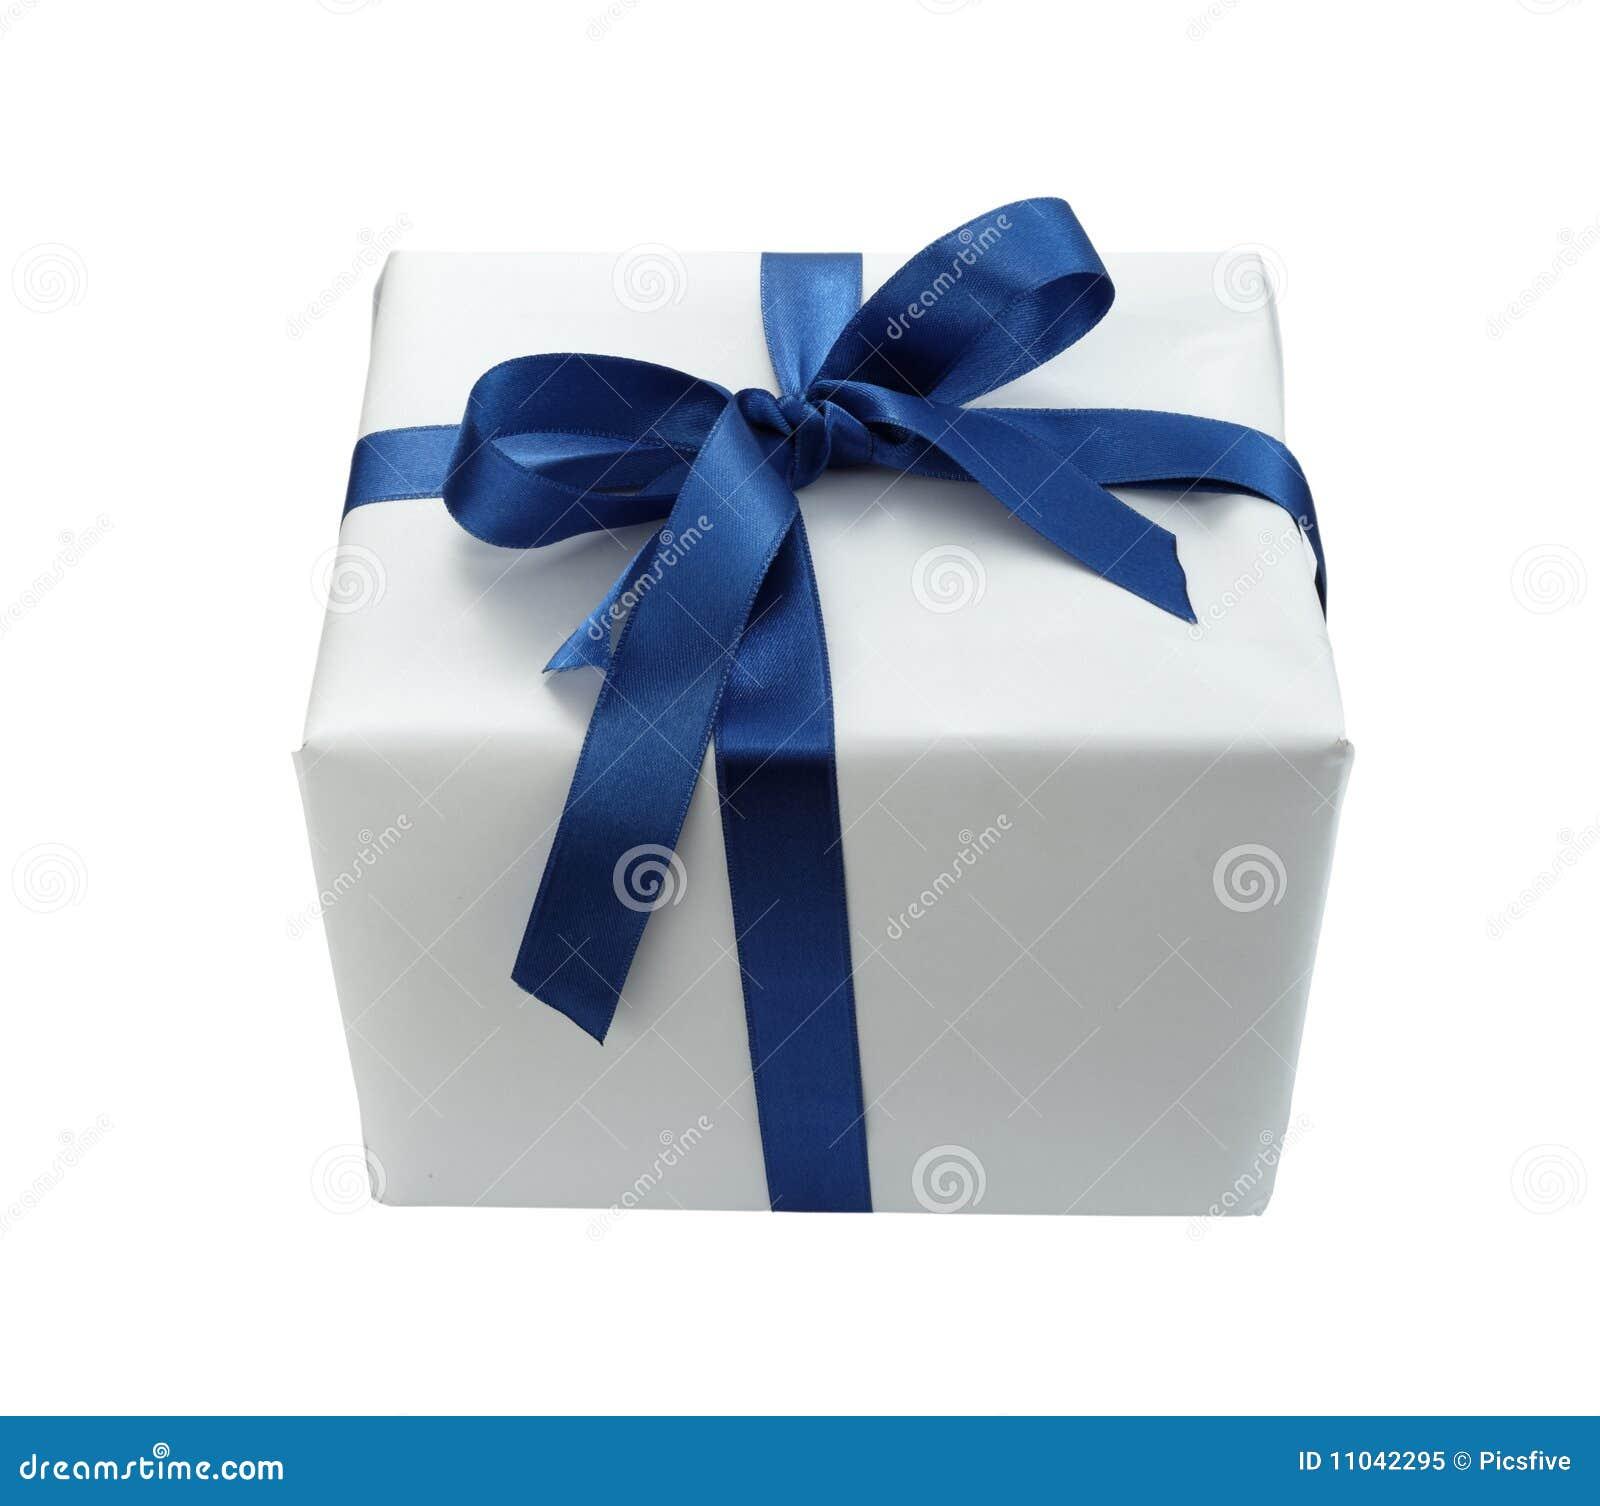 Red ribbon box present gift decoration